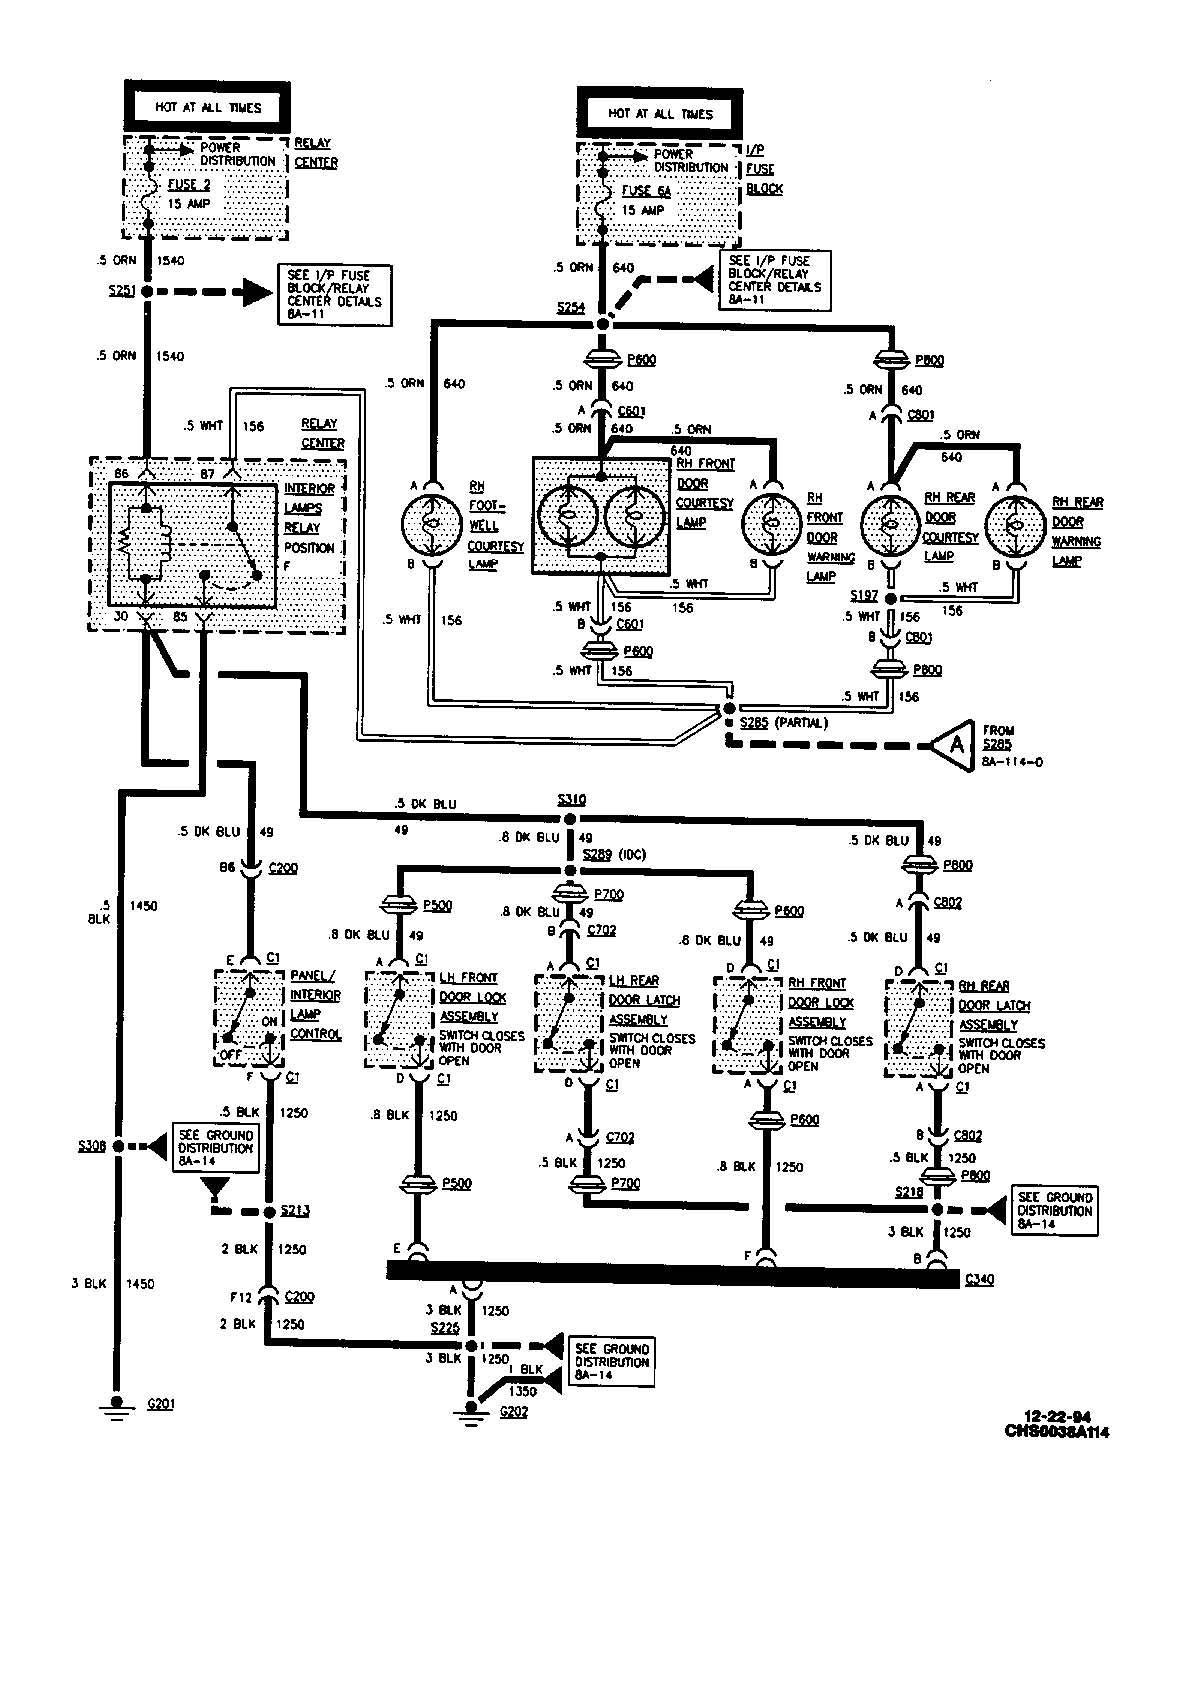 [SCHEMATICS_4FR]  WB_2291] 97 Buick Lesabre Vats Wiring Diagram Wiring Diagram   95 Buick Lesabre Ignition Wiring Diagram      Iness Vira Mohammedshrine Librar Wiring 101